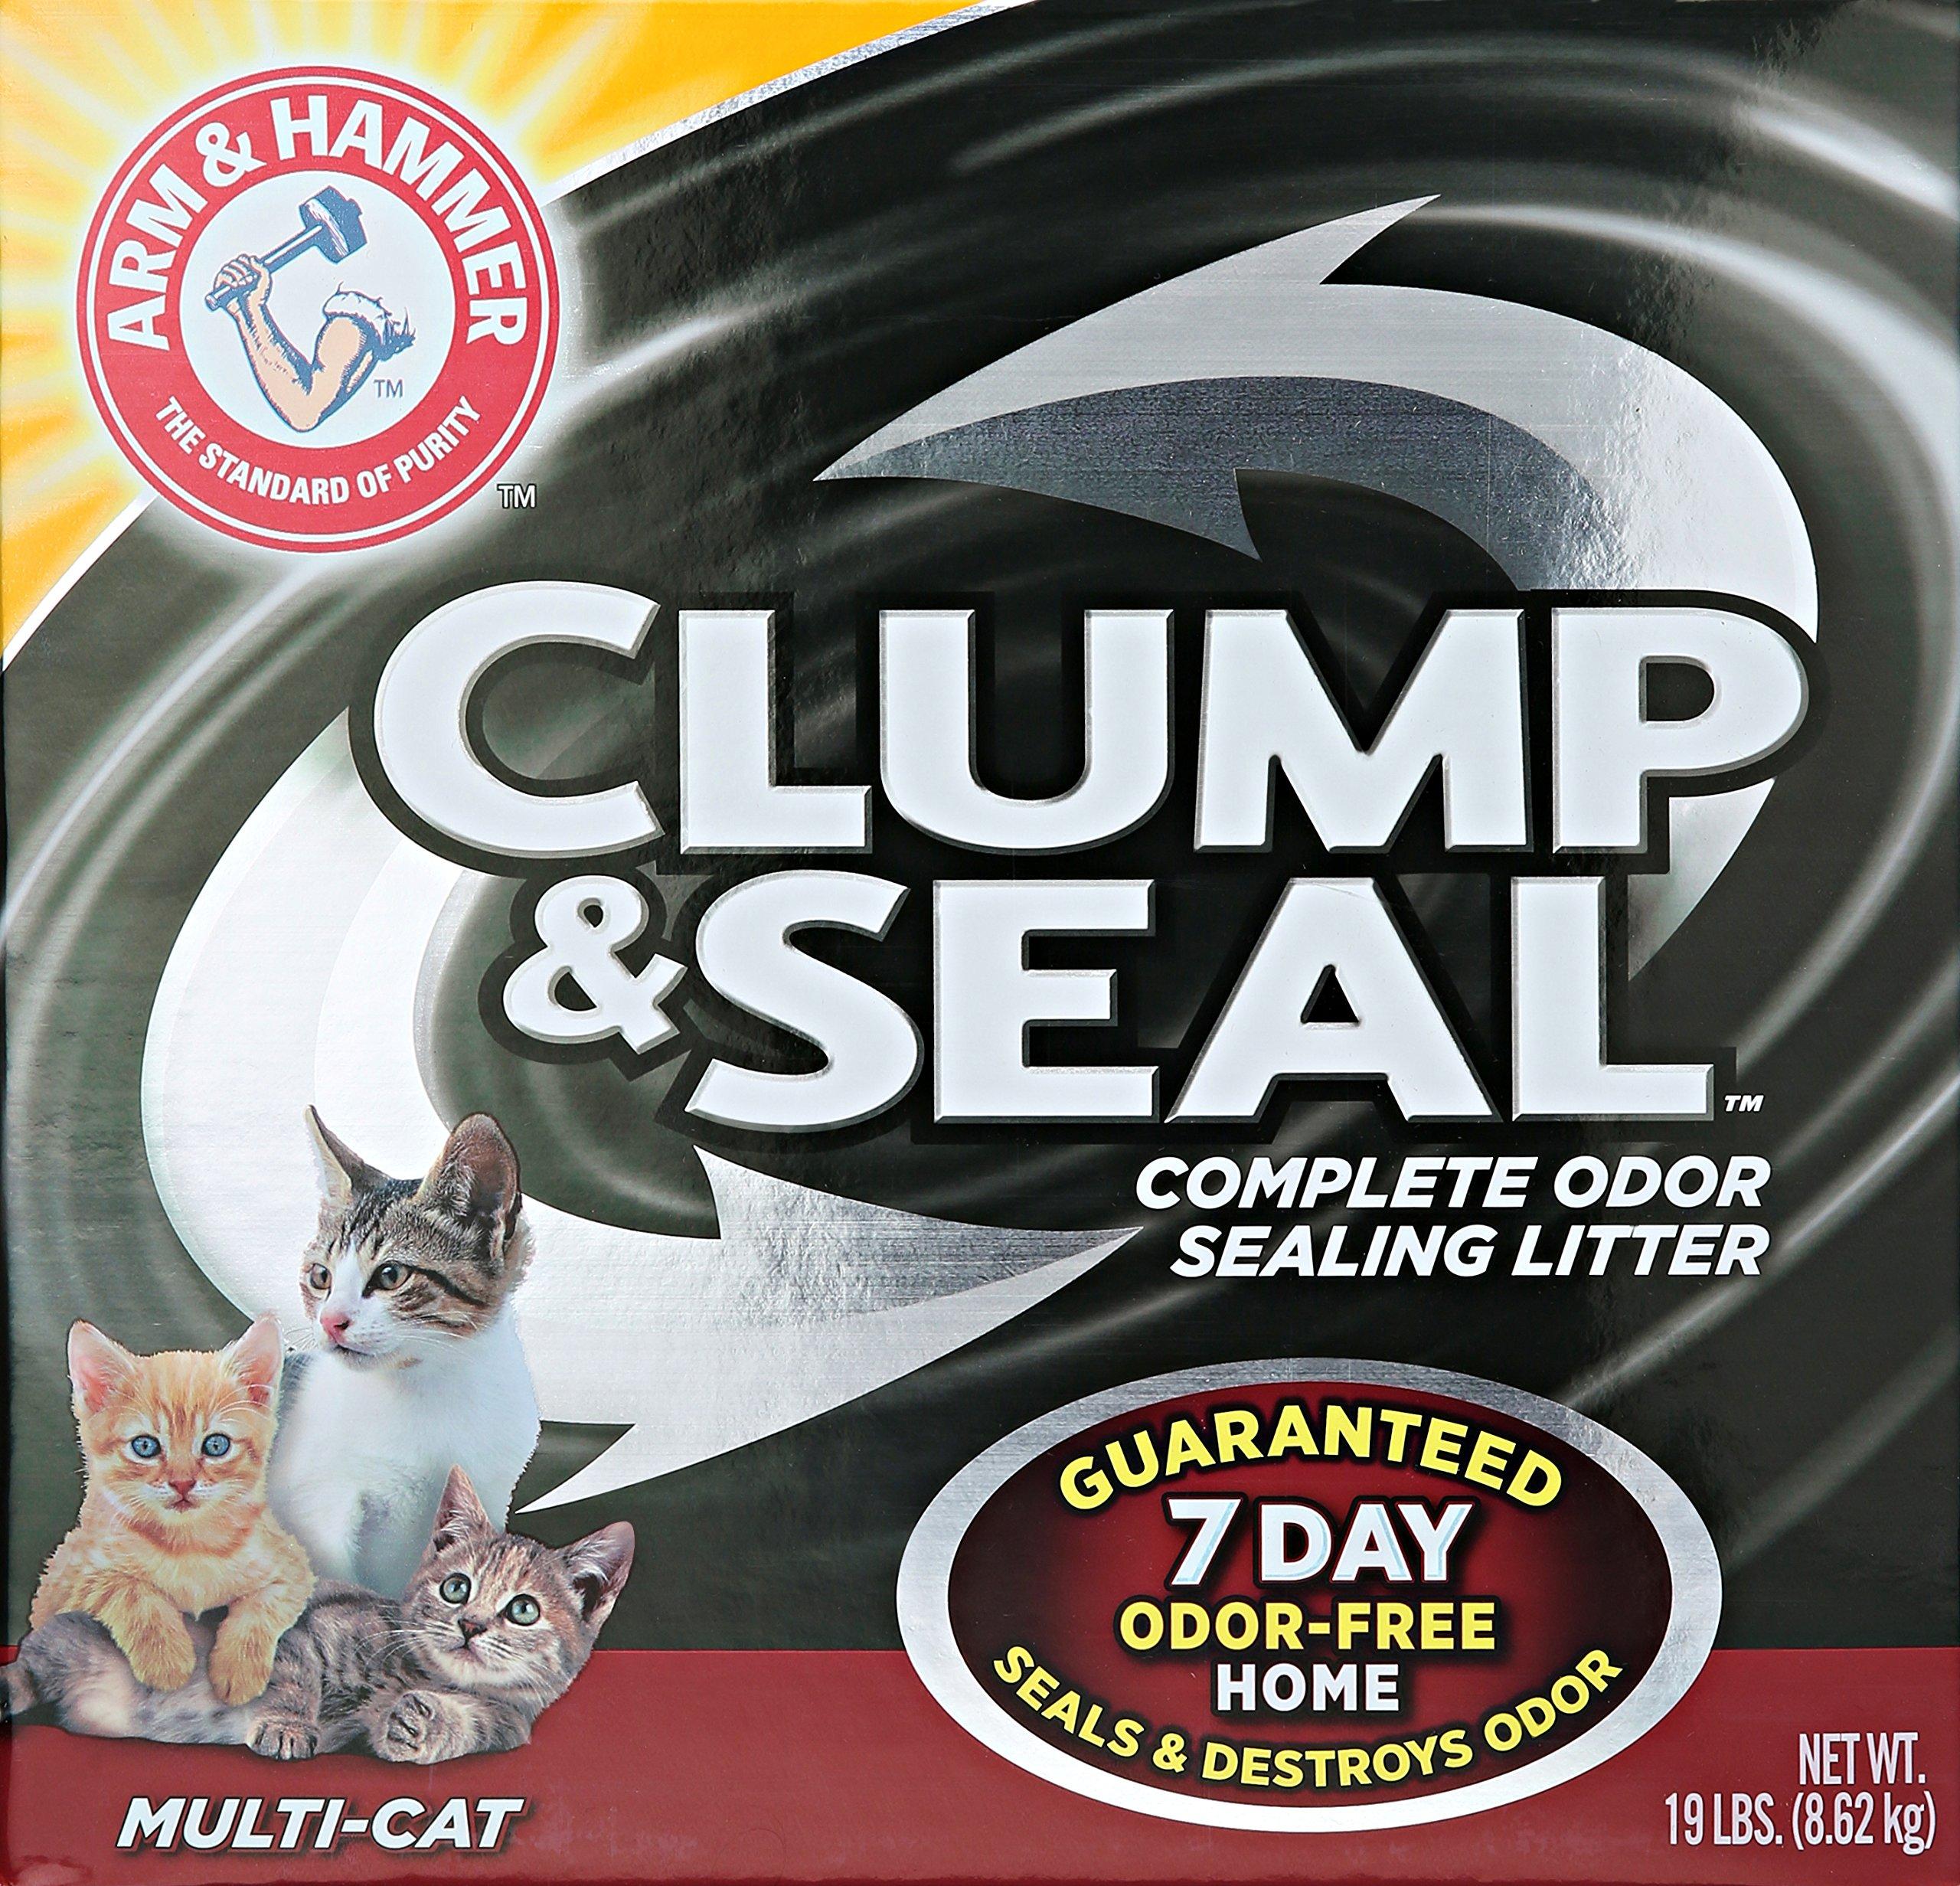 Arm & Hammer Clump & Seal Litter Multi-Cat 19 Lbs